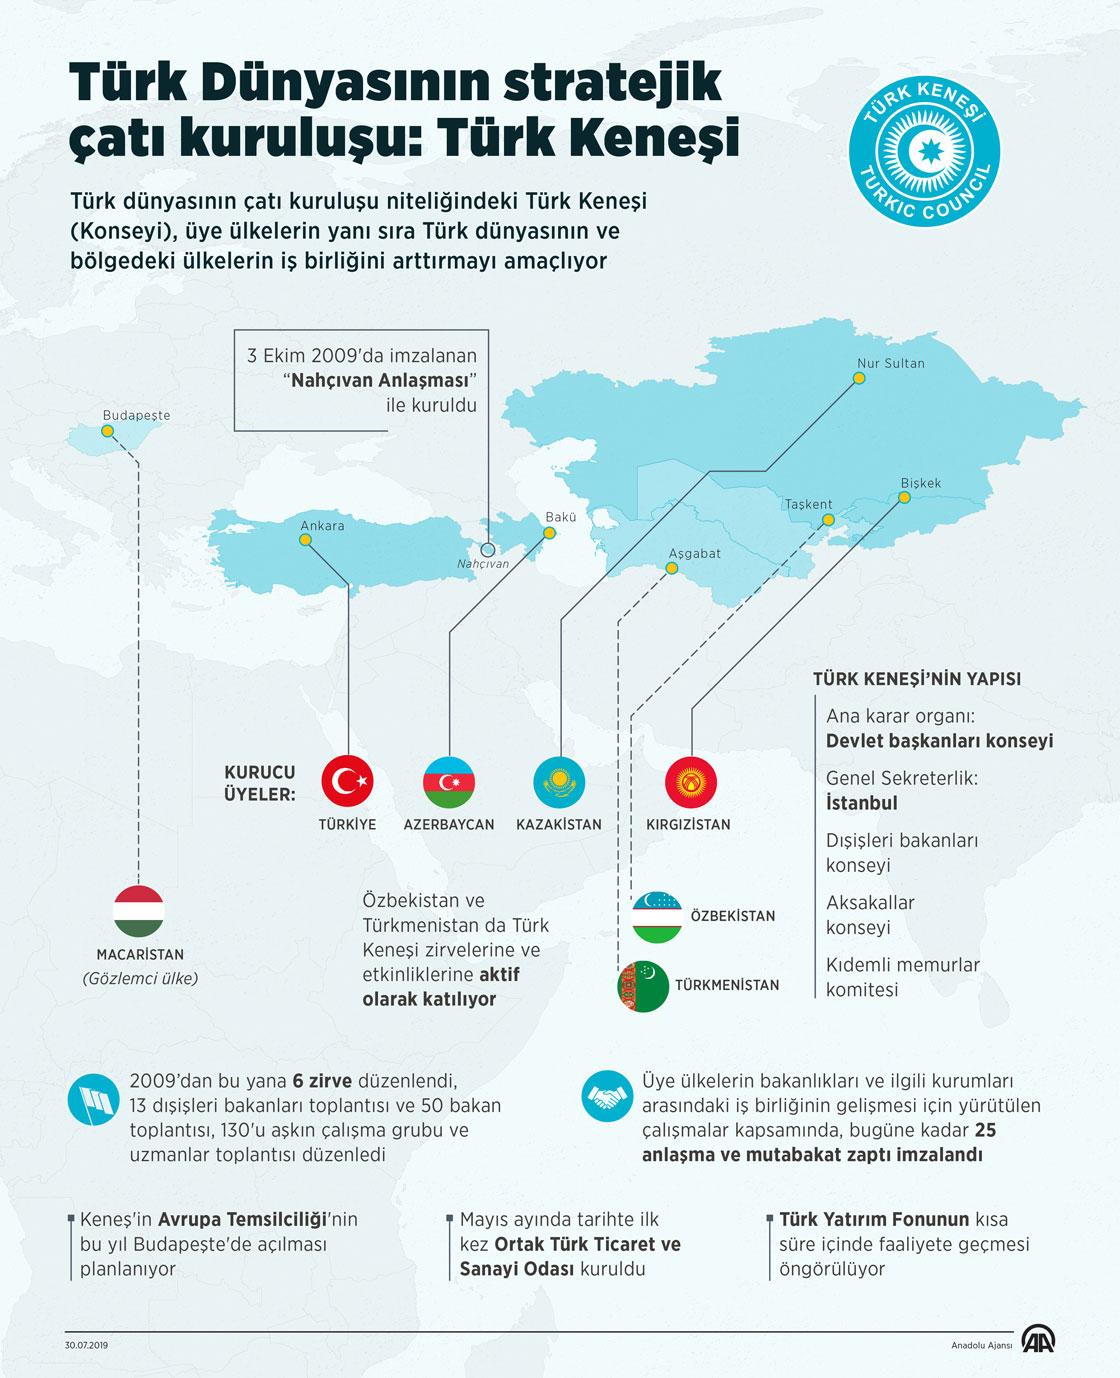 Turk Dunyasinin stratejik cati kurulusu Turk Kenesi